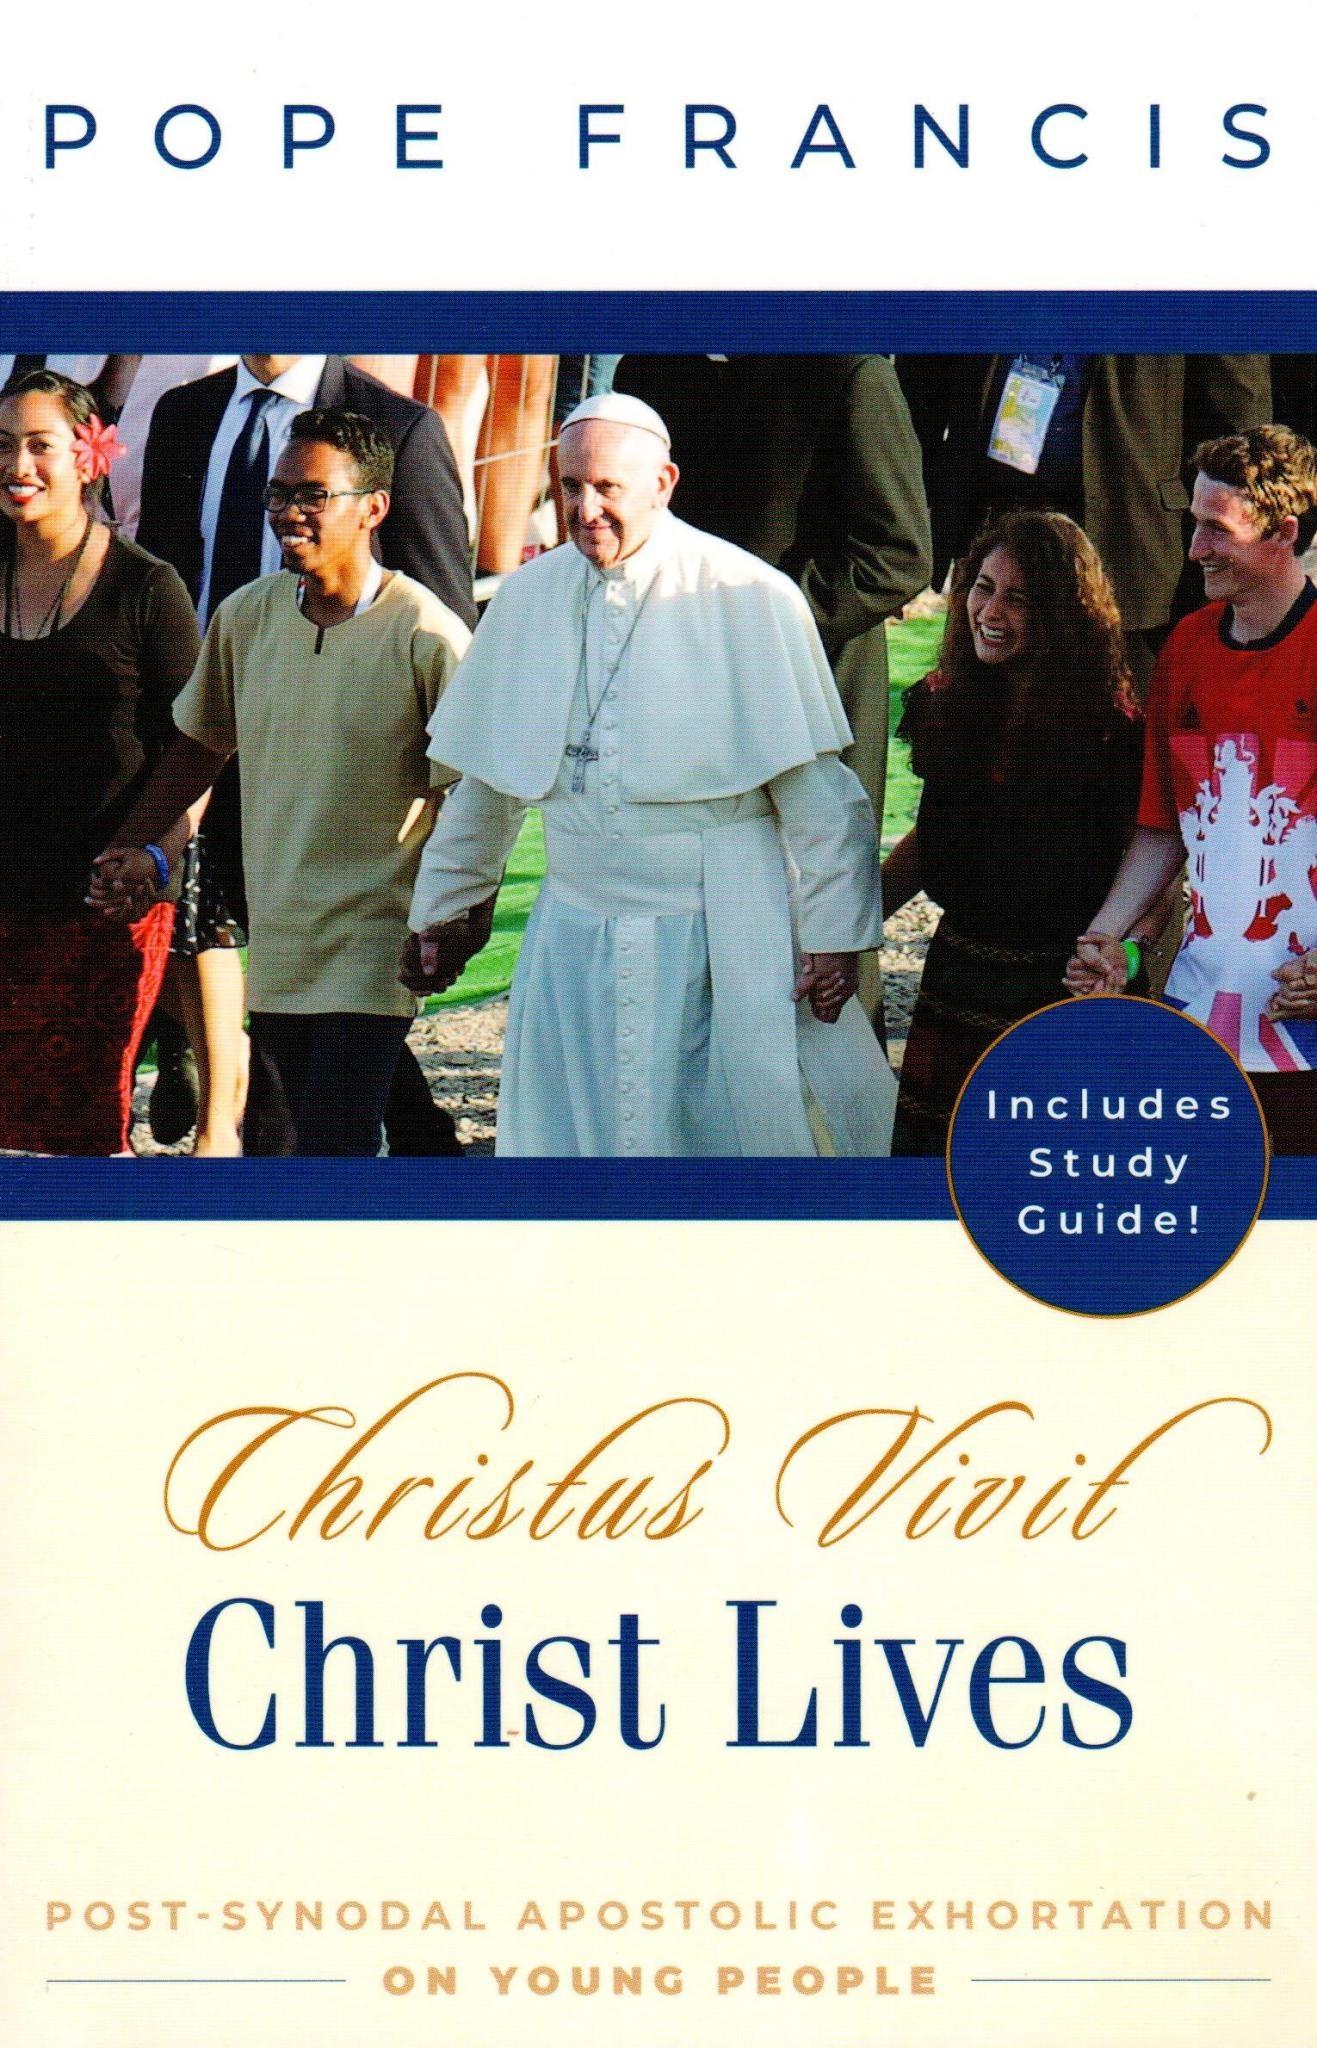 Christ Lives: Christus Vivit: Post-Synodal Apostolic Exhortation on Young People